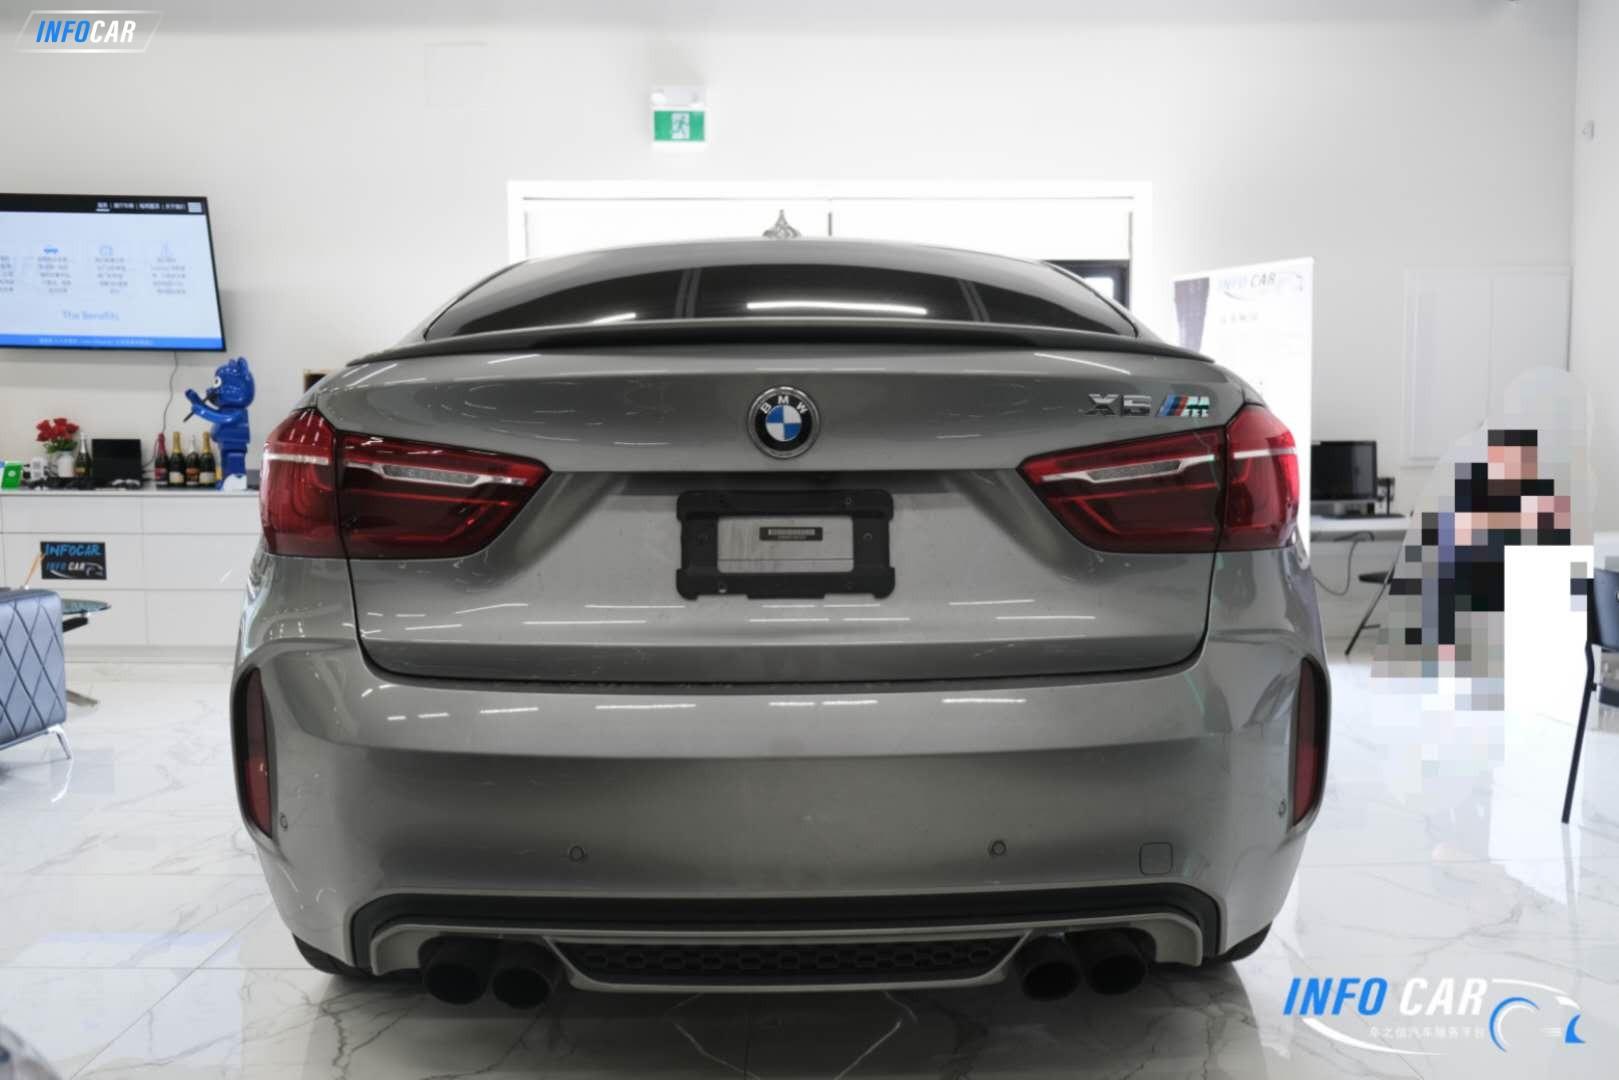 2017 BMW X6 M - INFOCAR - Toronto's Most Comprehensive New and Used Auto Trading Platform